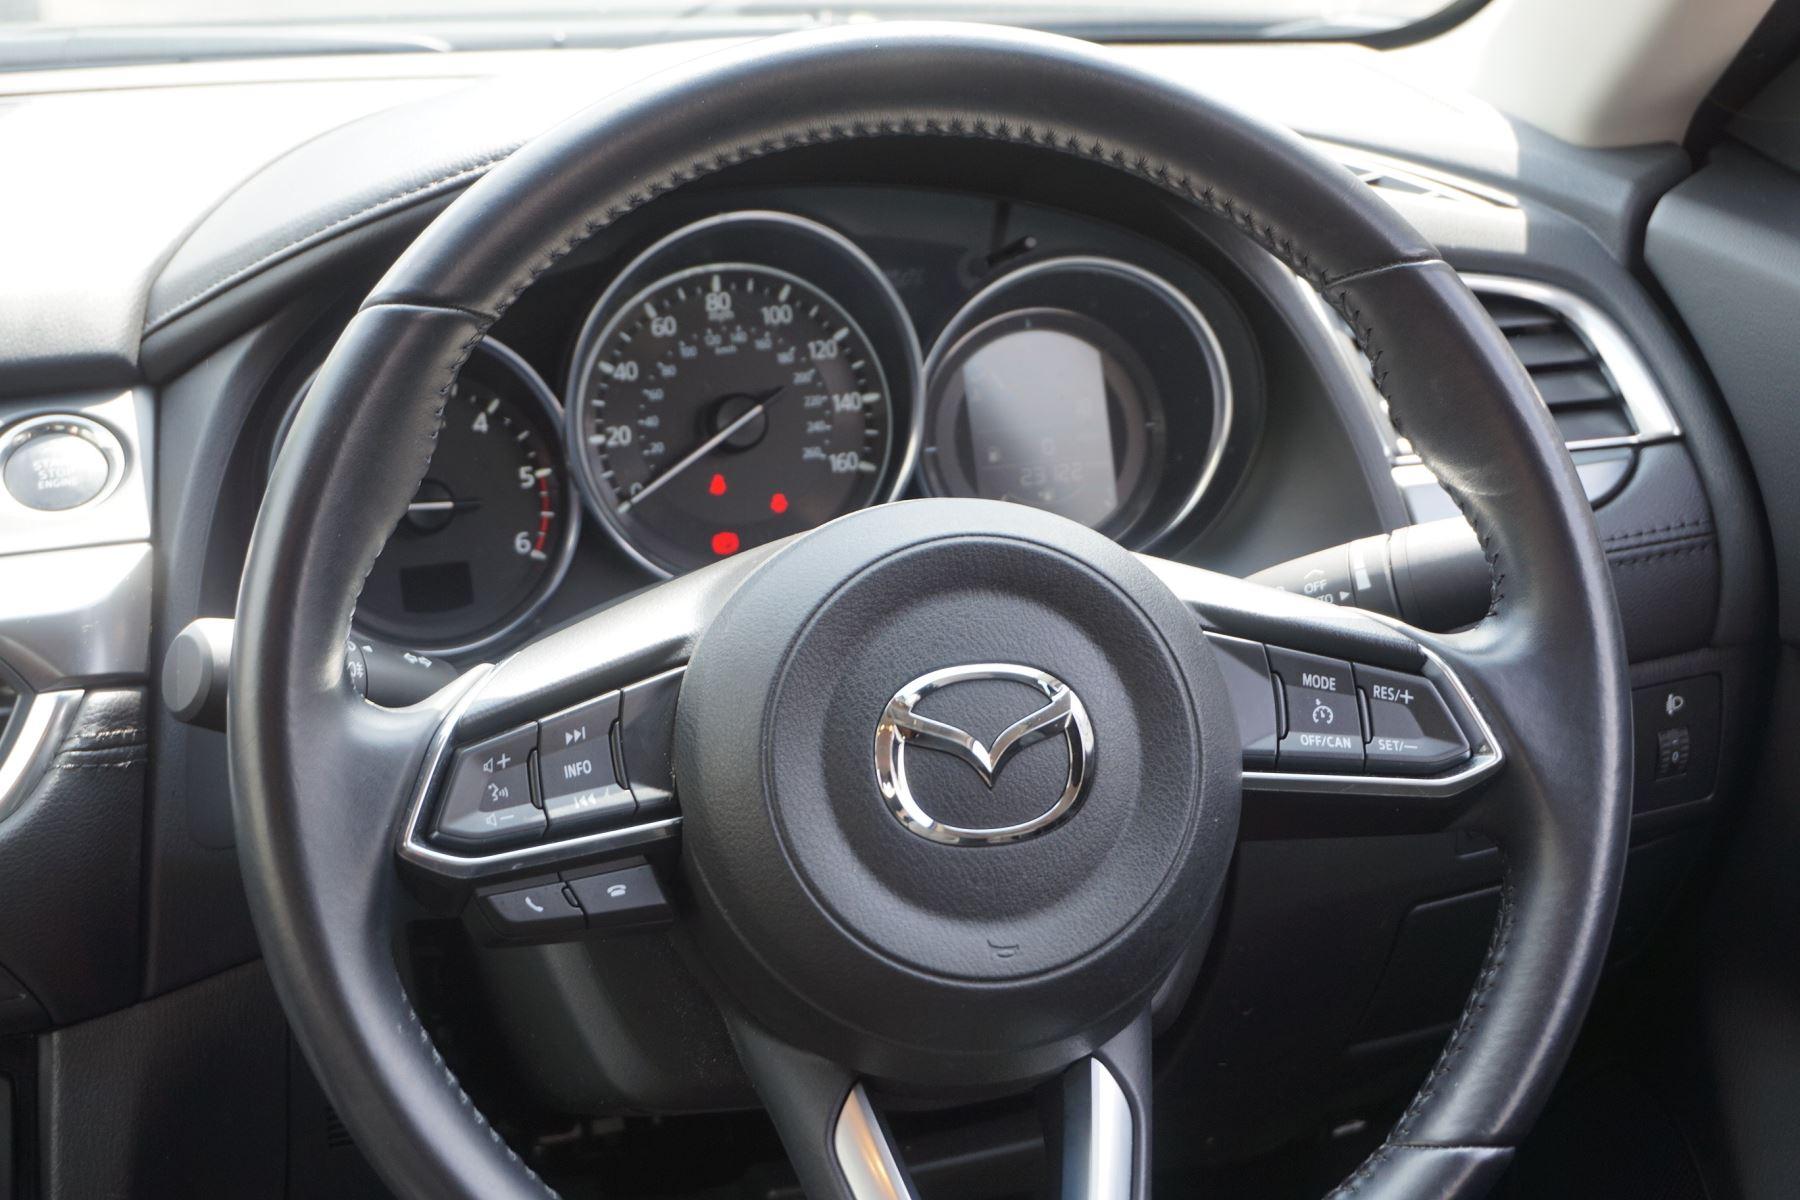 Mazda 6 2.2d SE-L Nav 4dr image 17